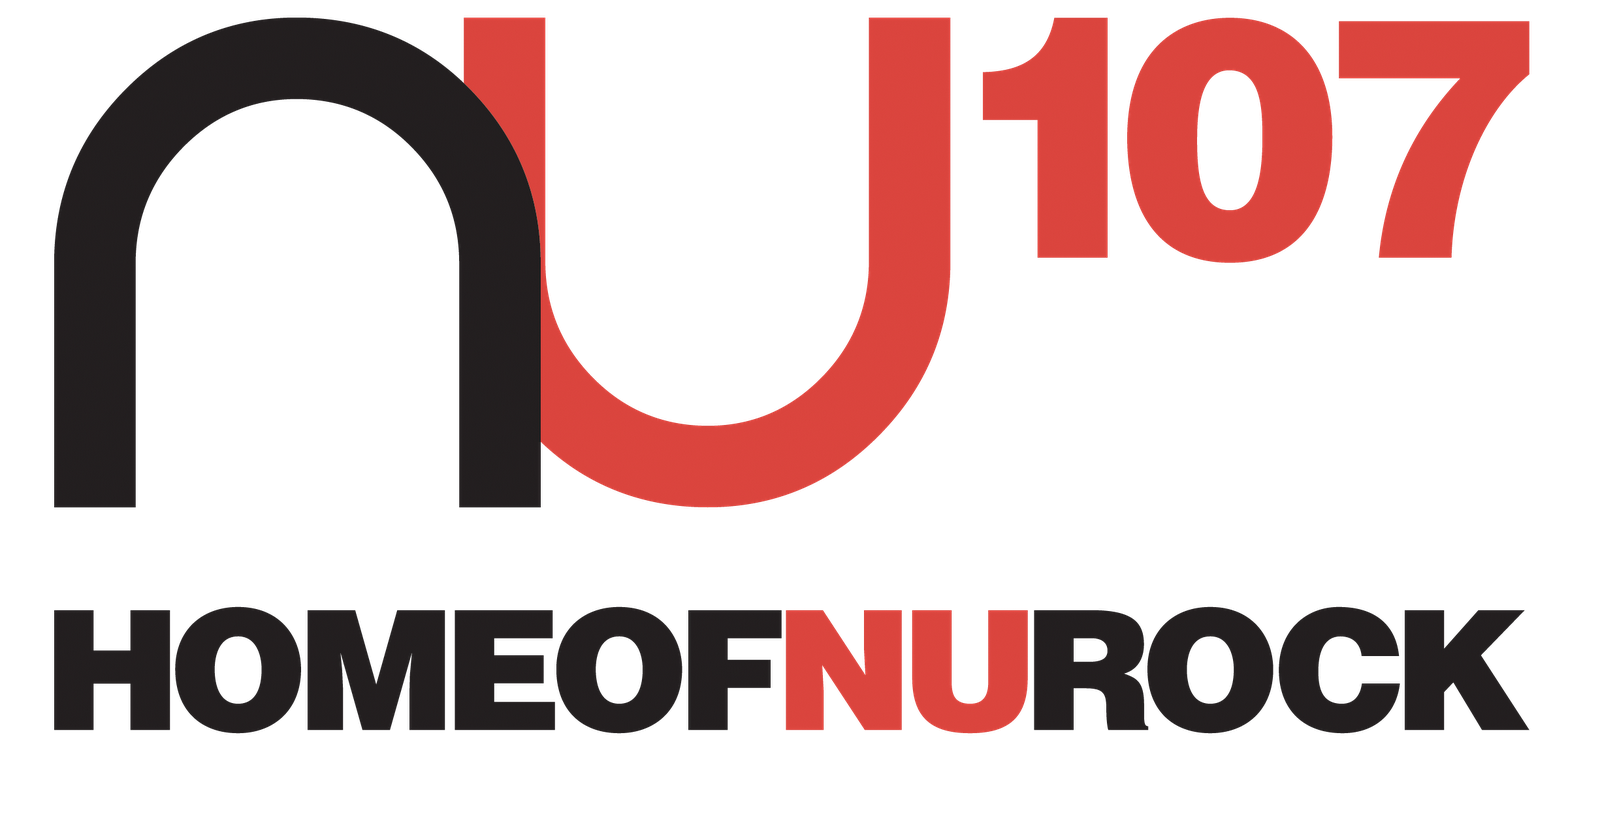 nu107-logo-new.png